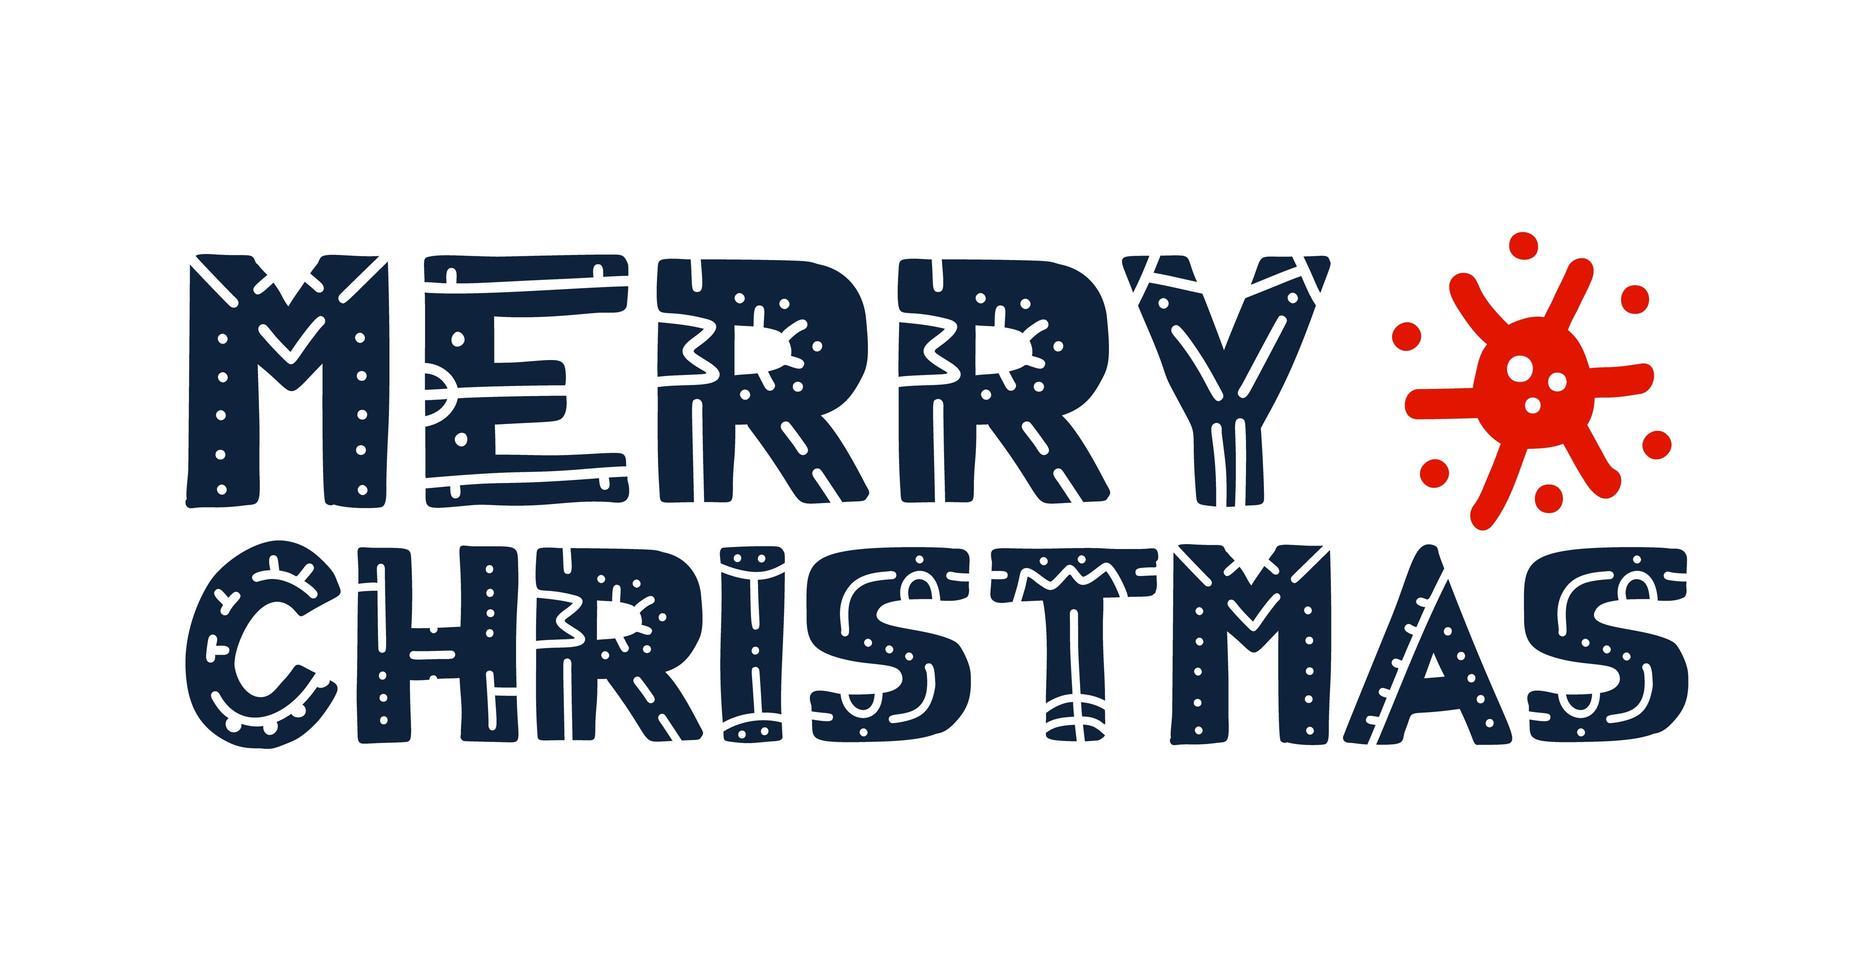 skandinavisches Frohe Weihnachten Coronavirus Typografie Poster vektor